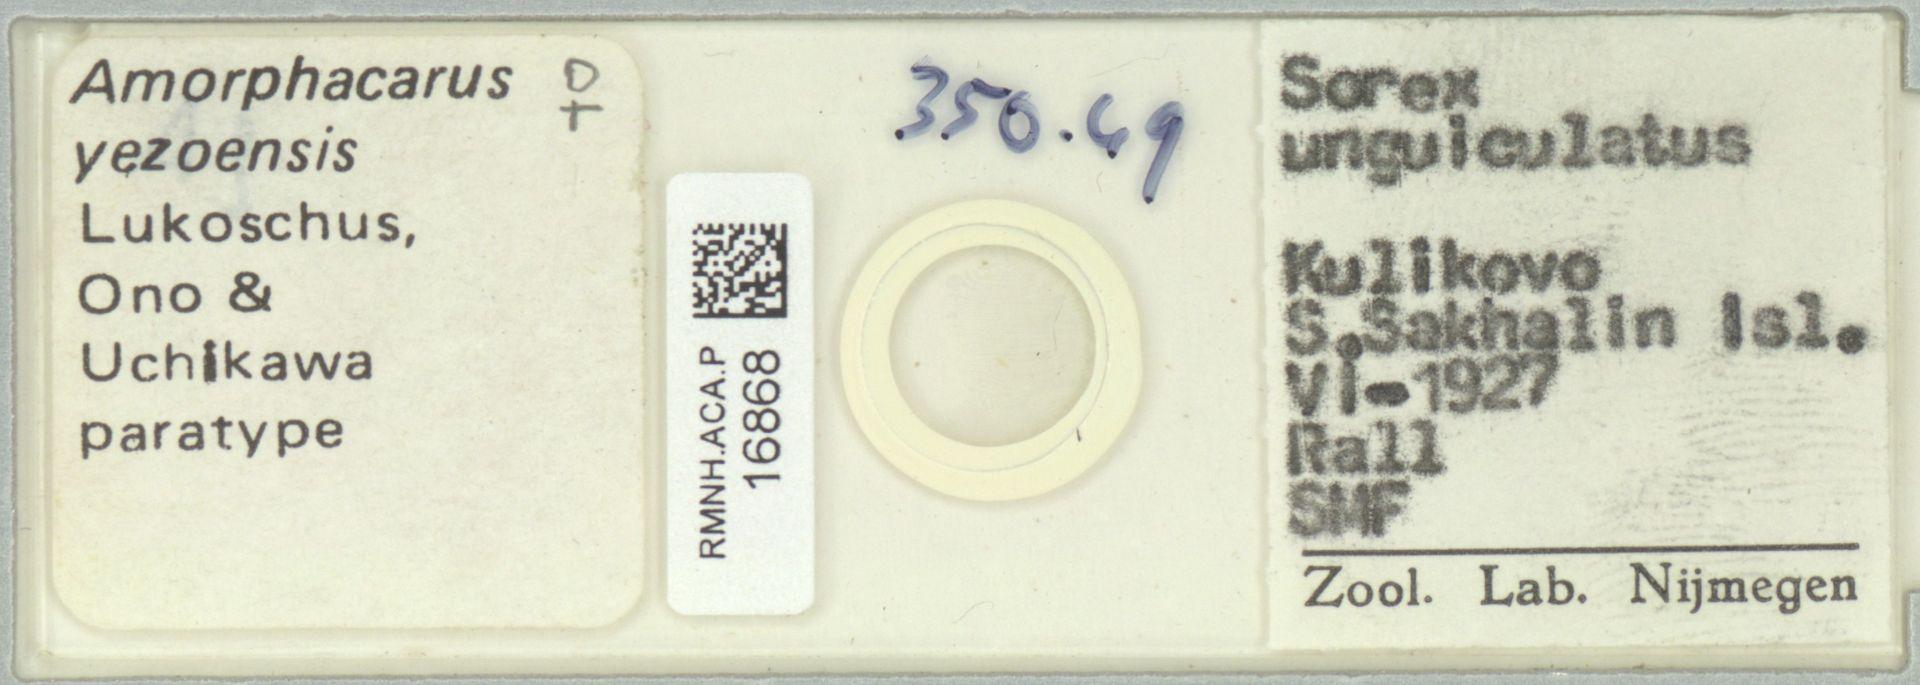 RMNH.ACA.P.16868 | Amorphacarus yezoensis Lukoschus